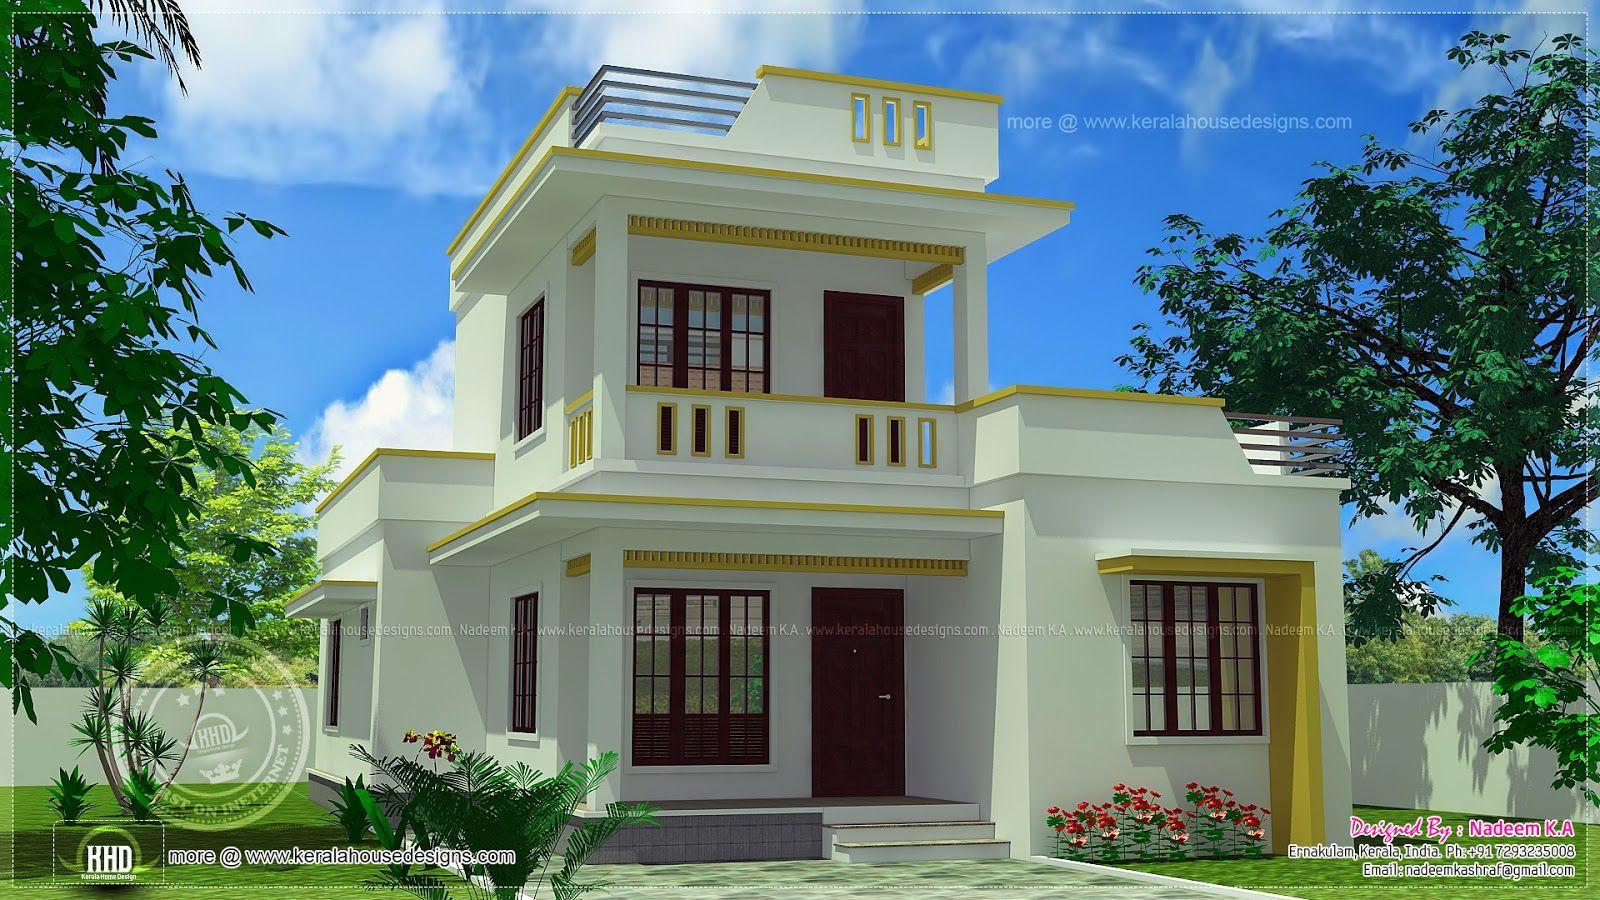 Simple Design Home Amazingpictcom Wallpapers House Design